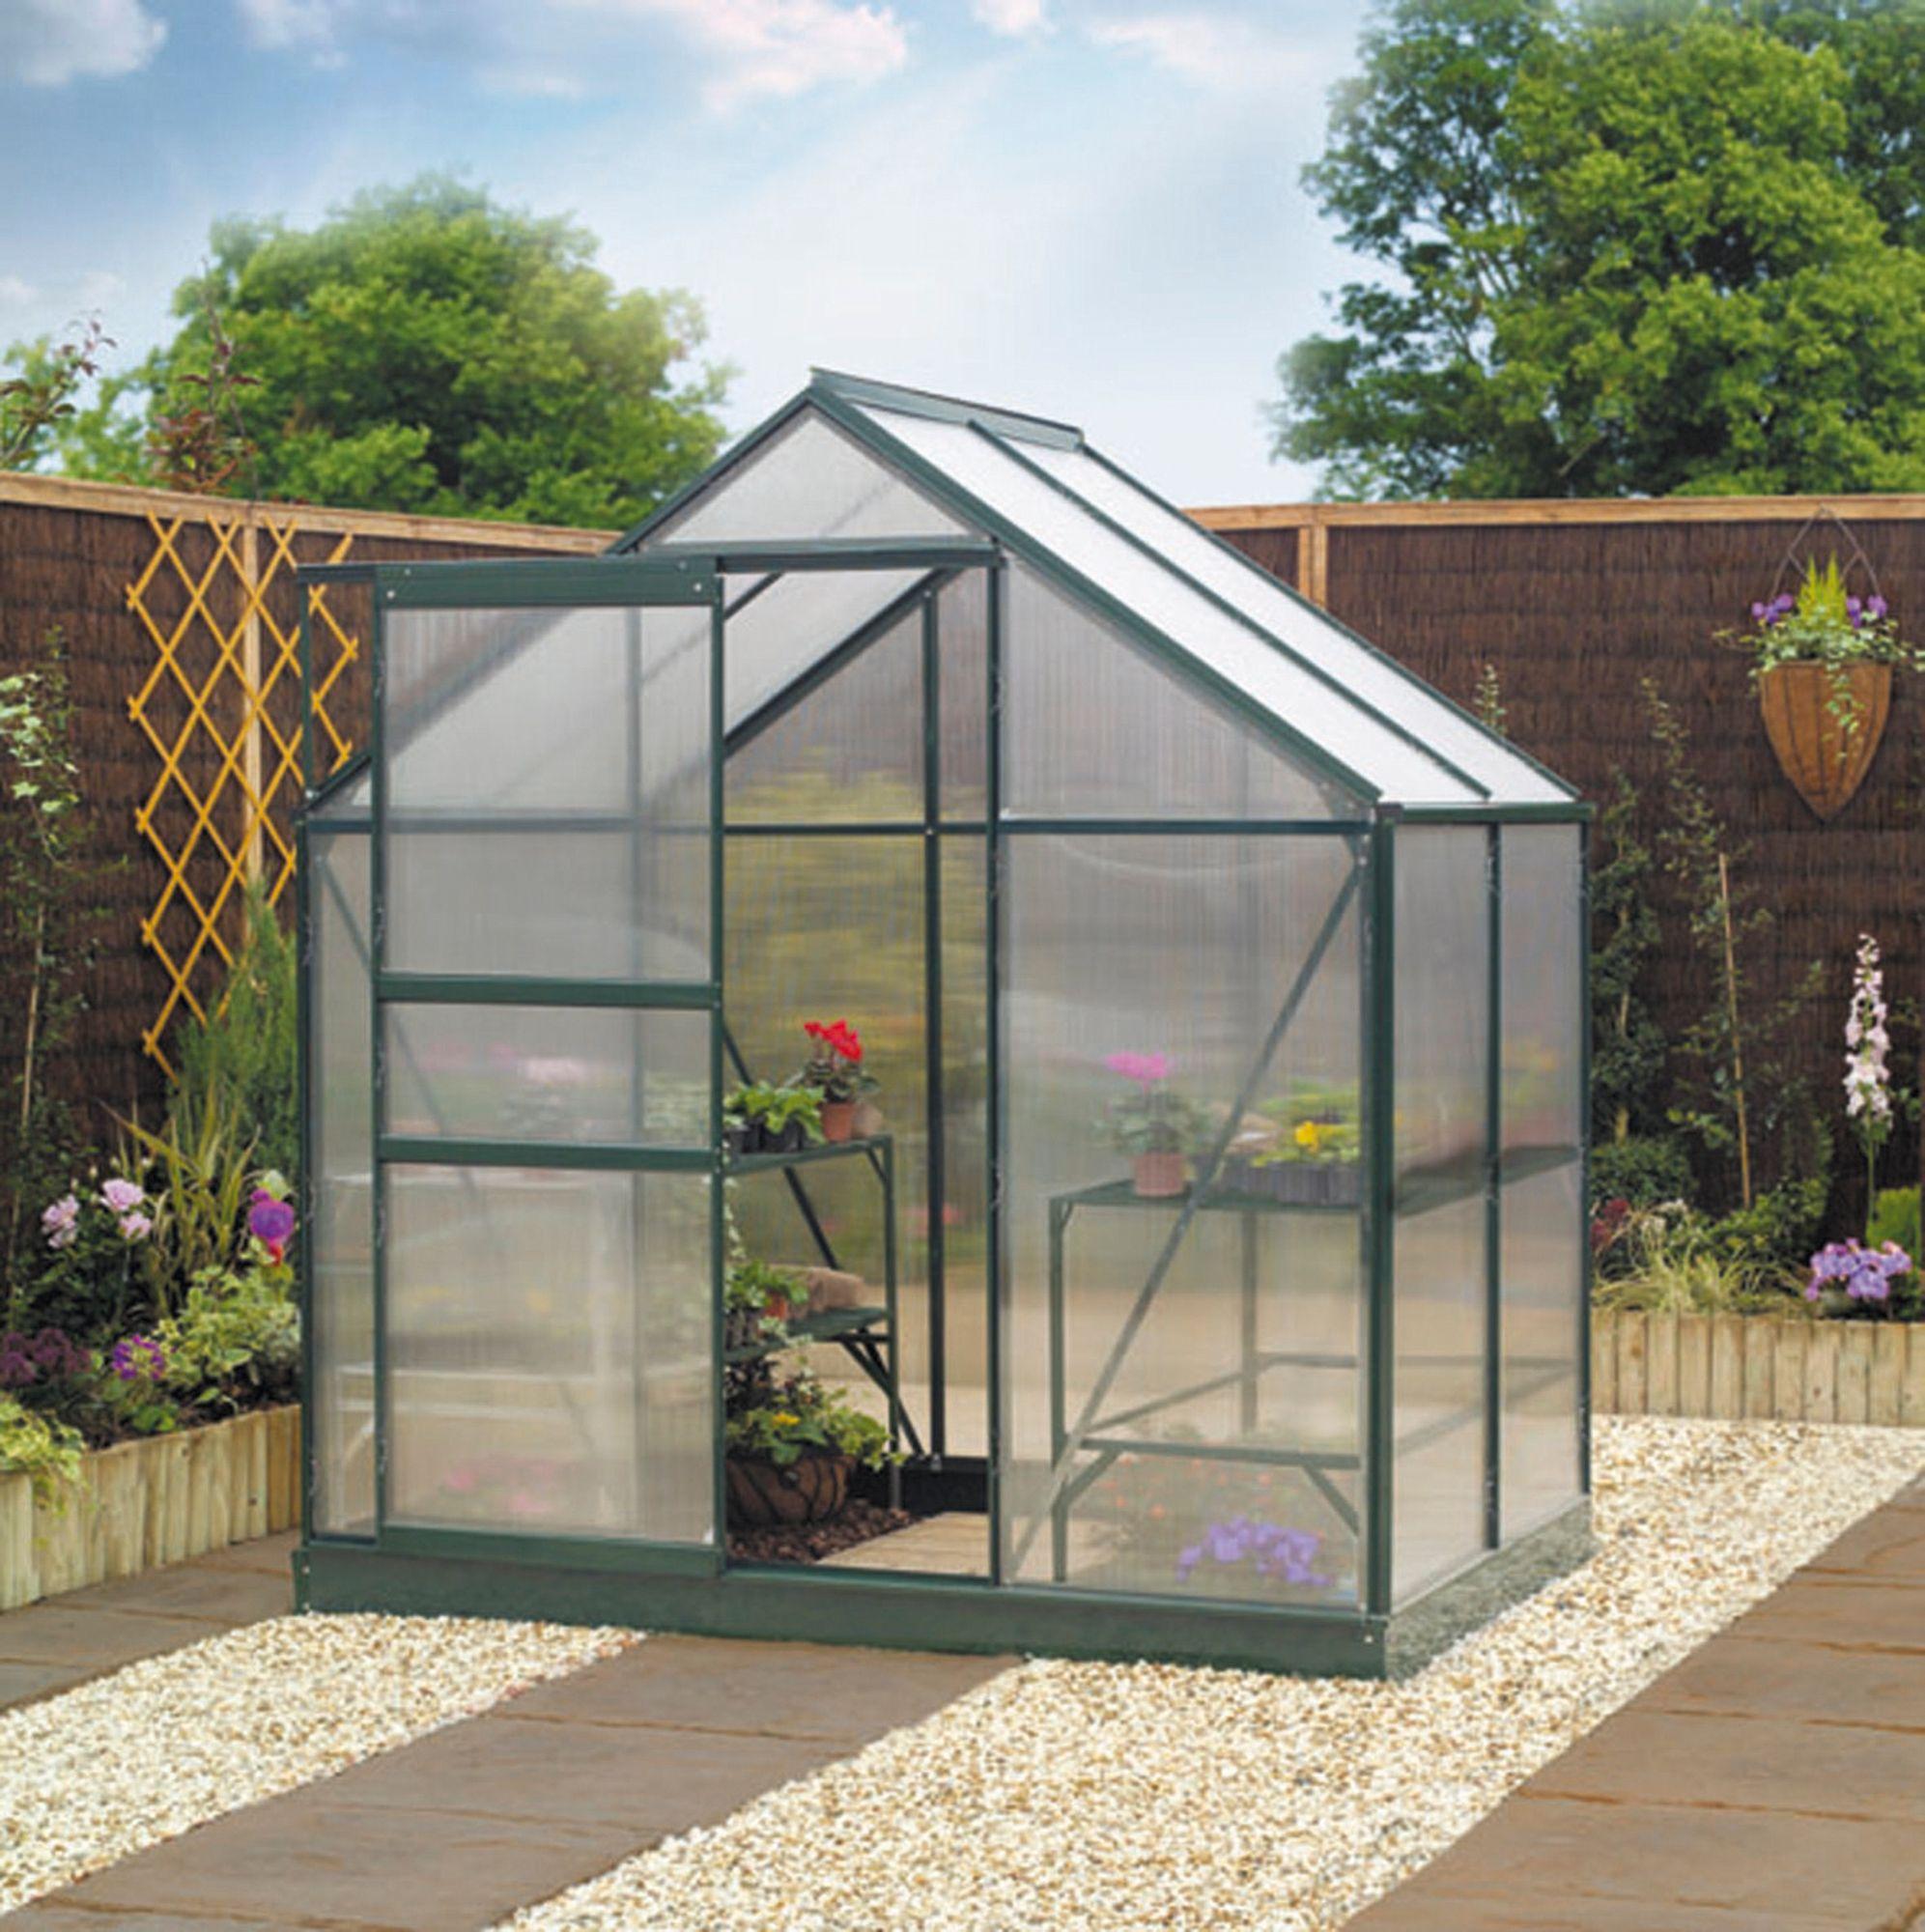 Window Greenhouse Insert Kitchen Window Greenhouses: B&Q Metal Greenhouse Frame & Base 6X4